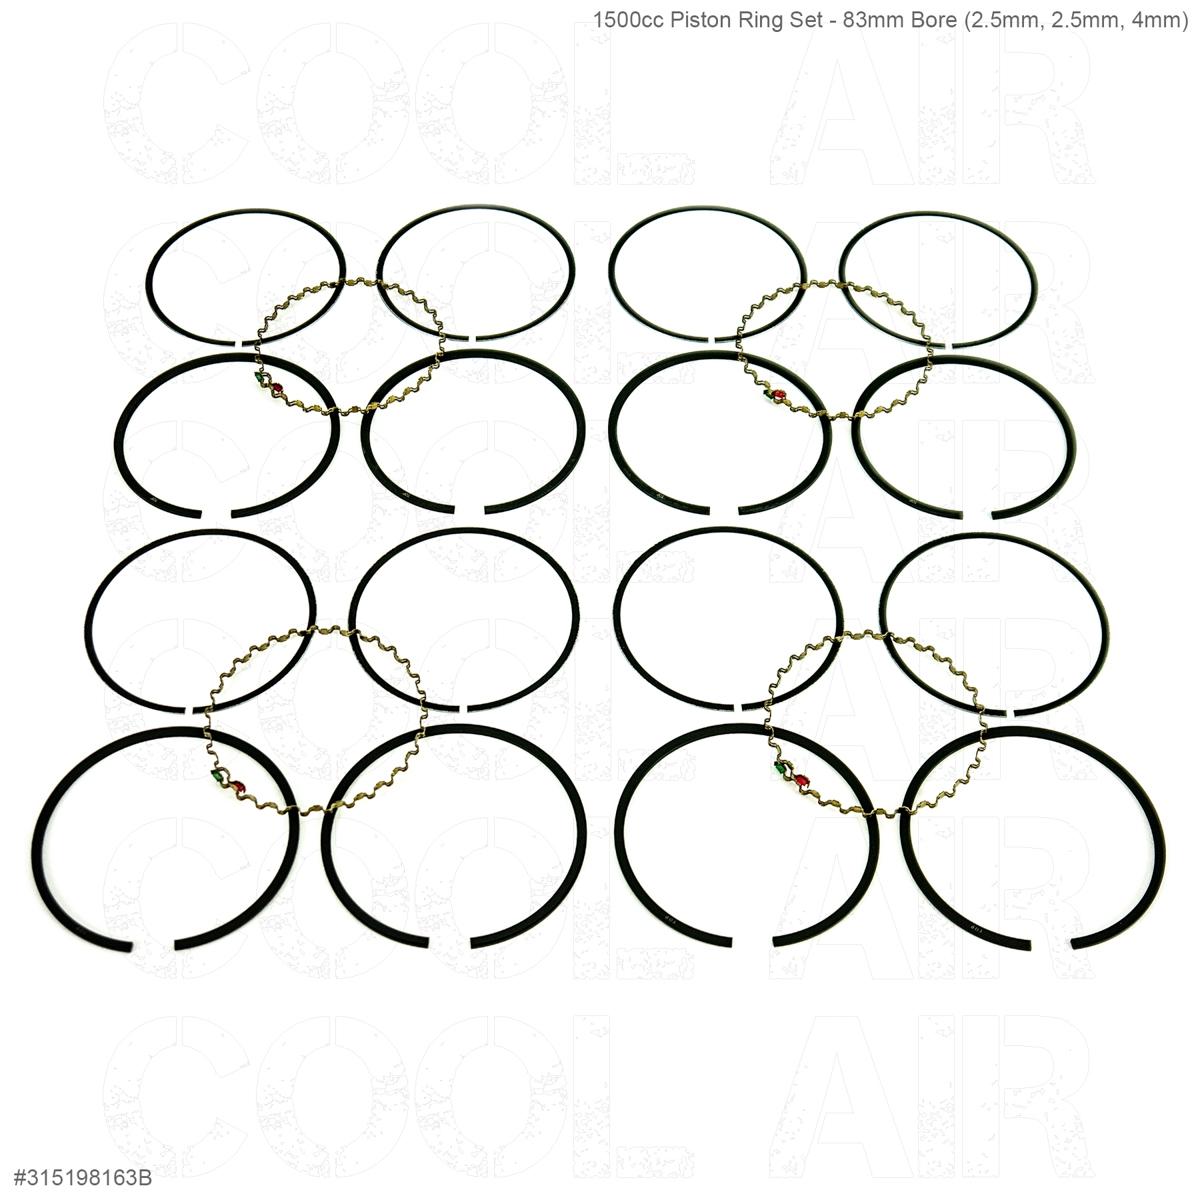 1500cc Piston Ring Set - 83mm Bore (2.5mm, 2.5mm, 4mm)